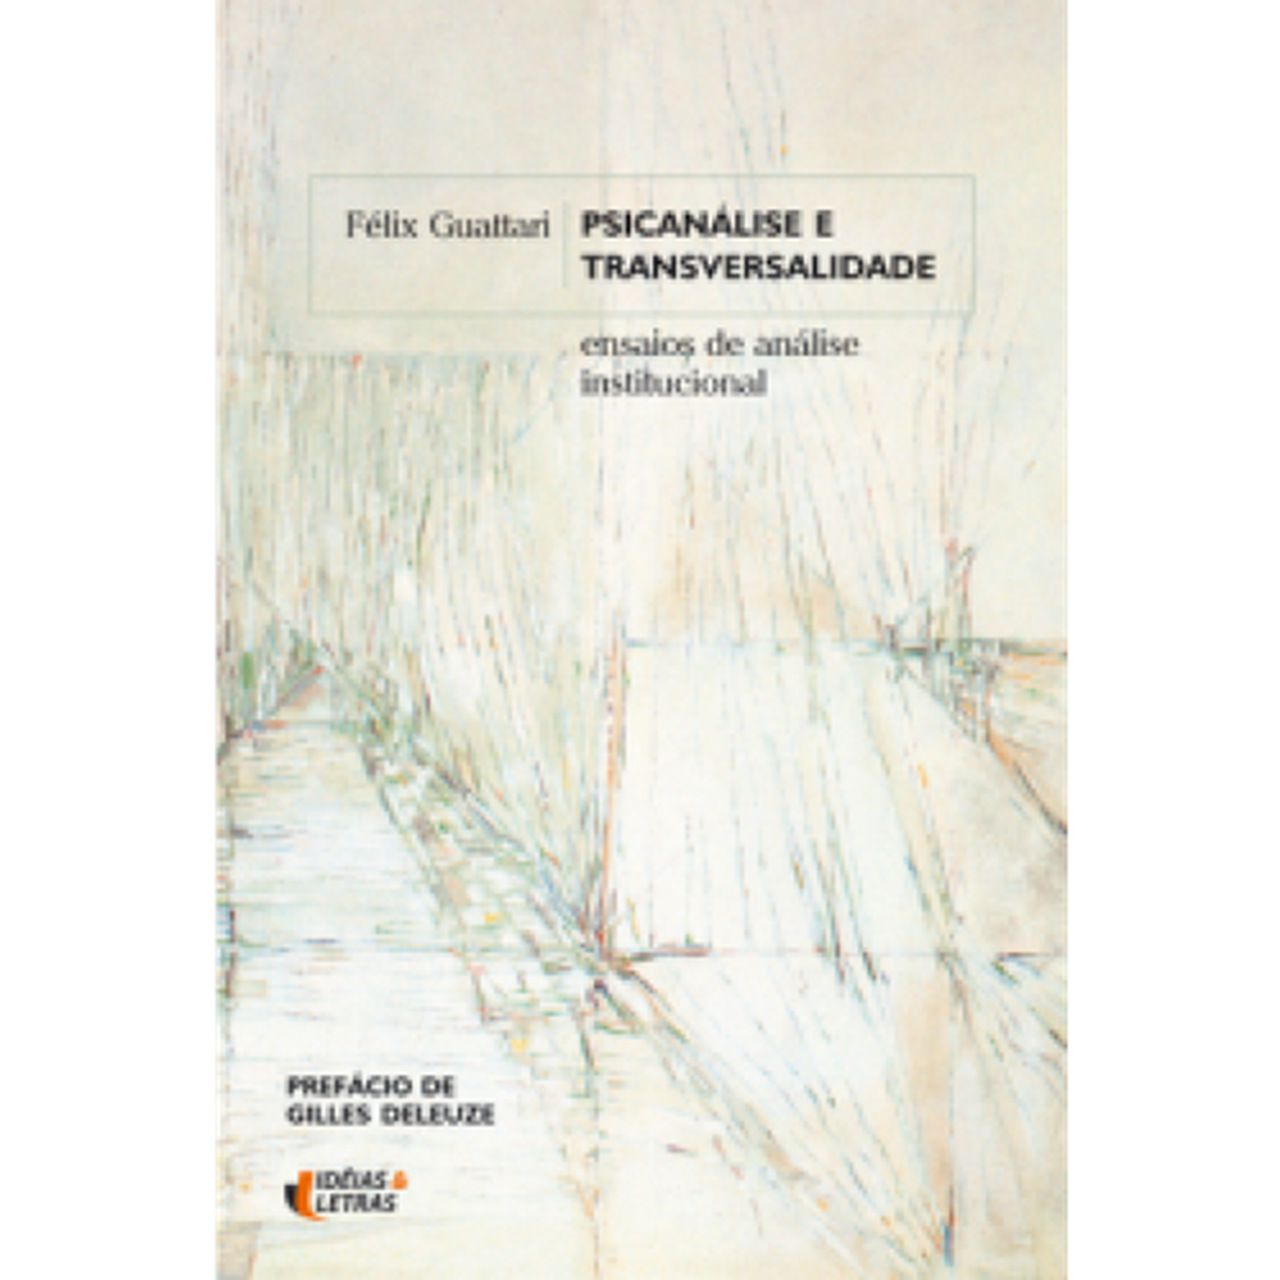 Psicanalise e Transversalidade